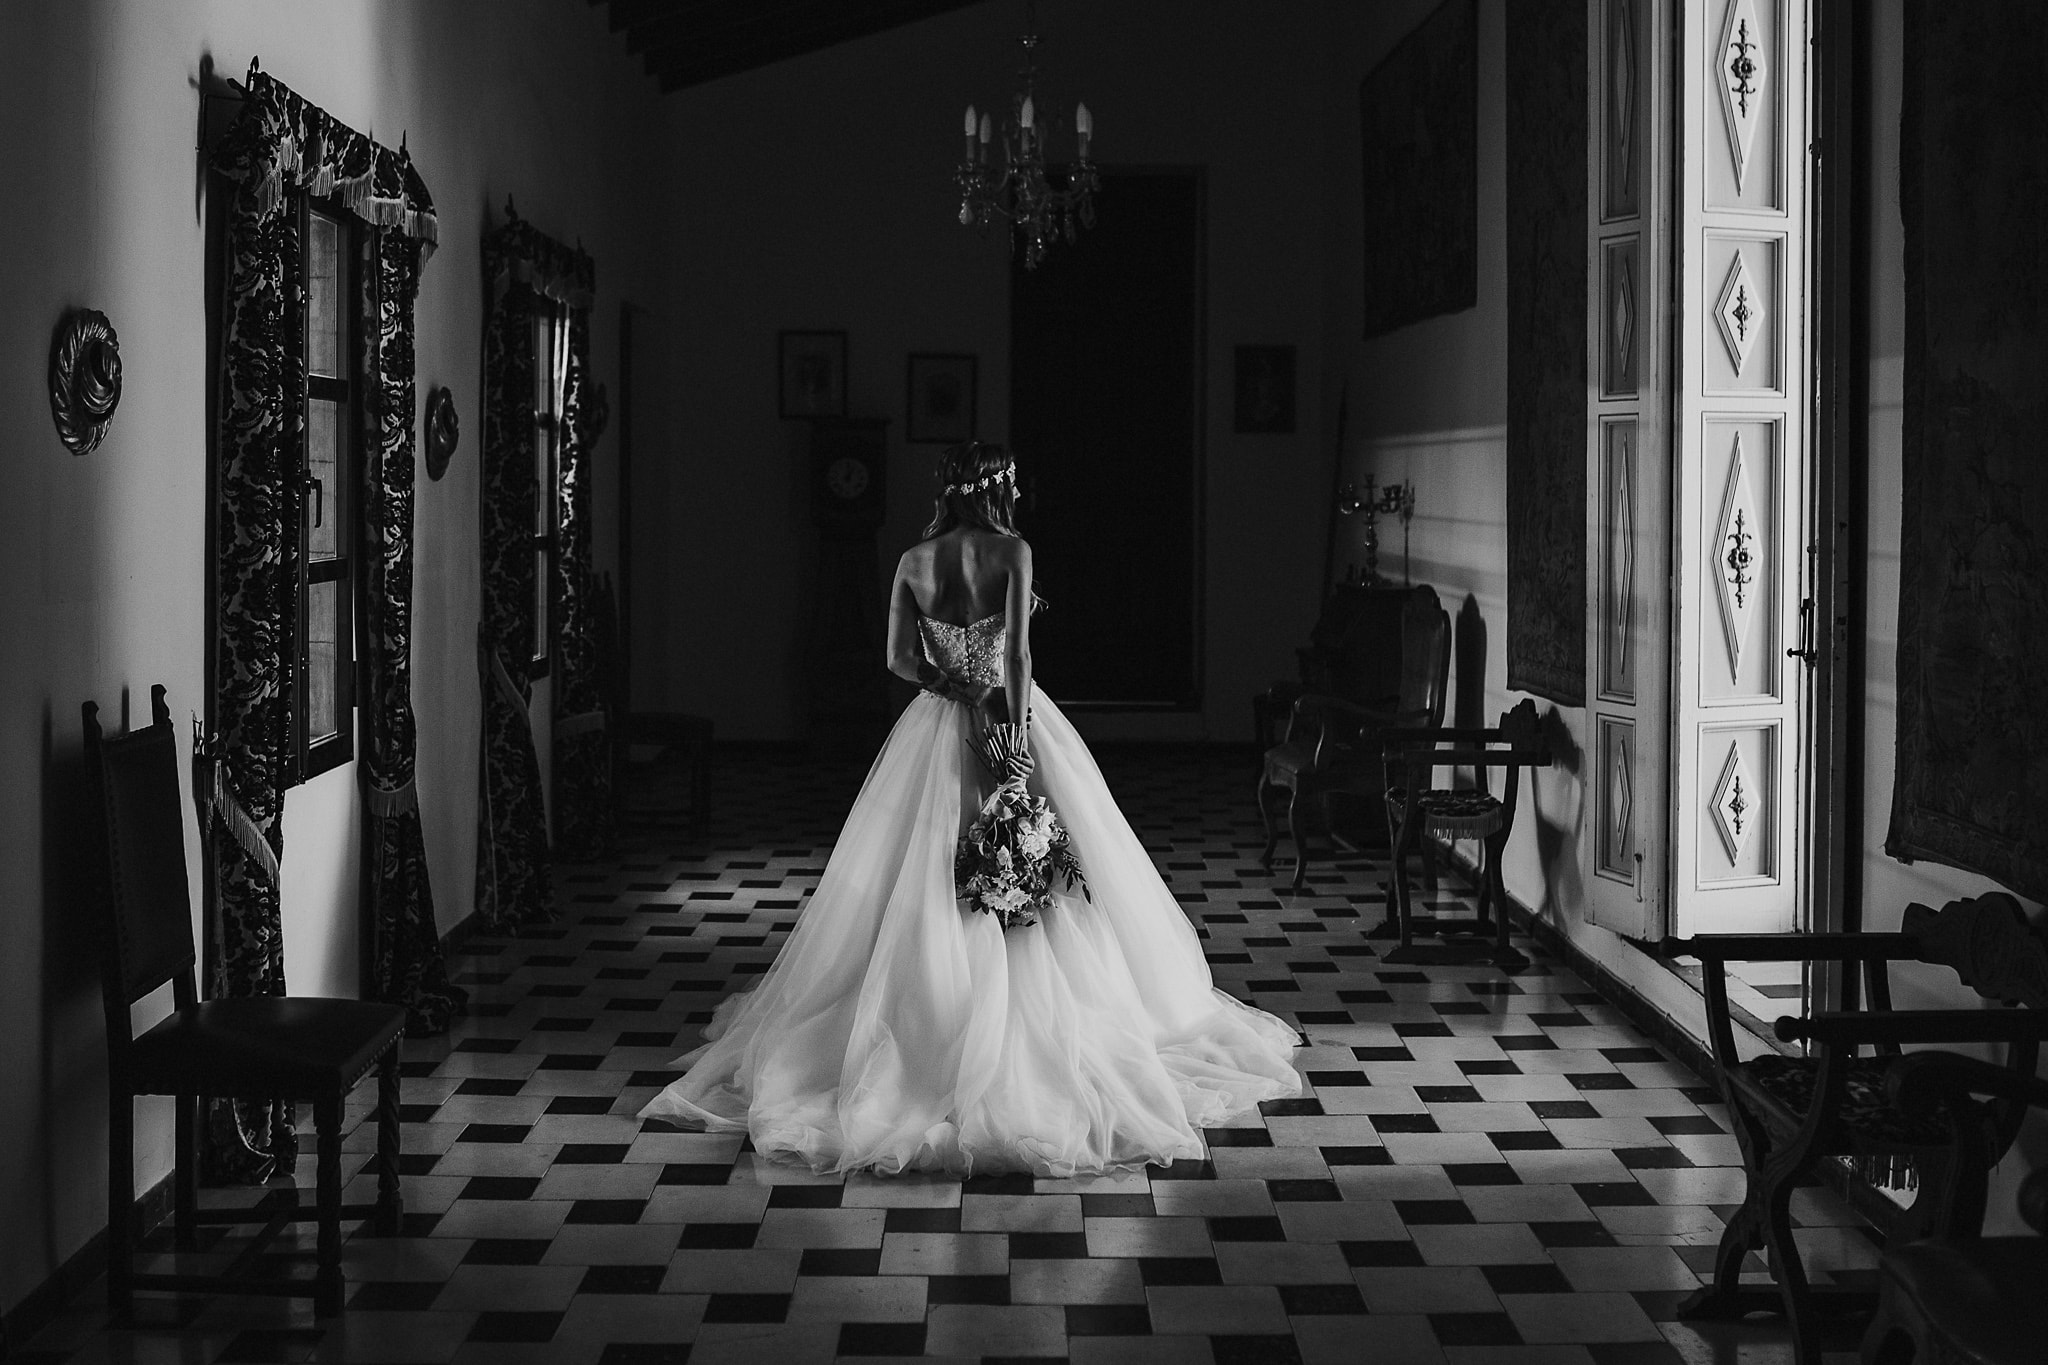 fotografo-bodas-altea-43